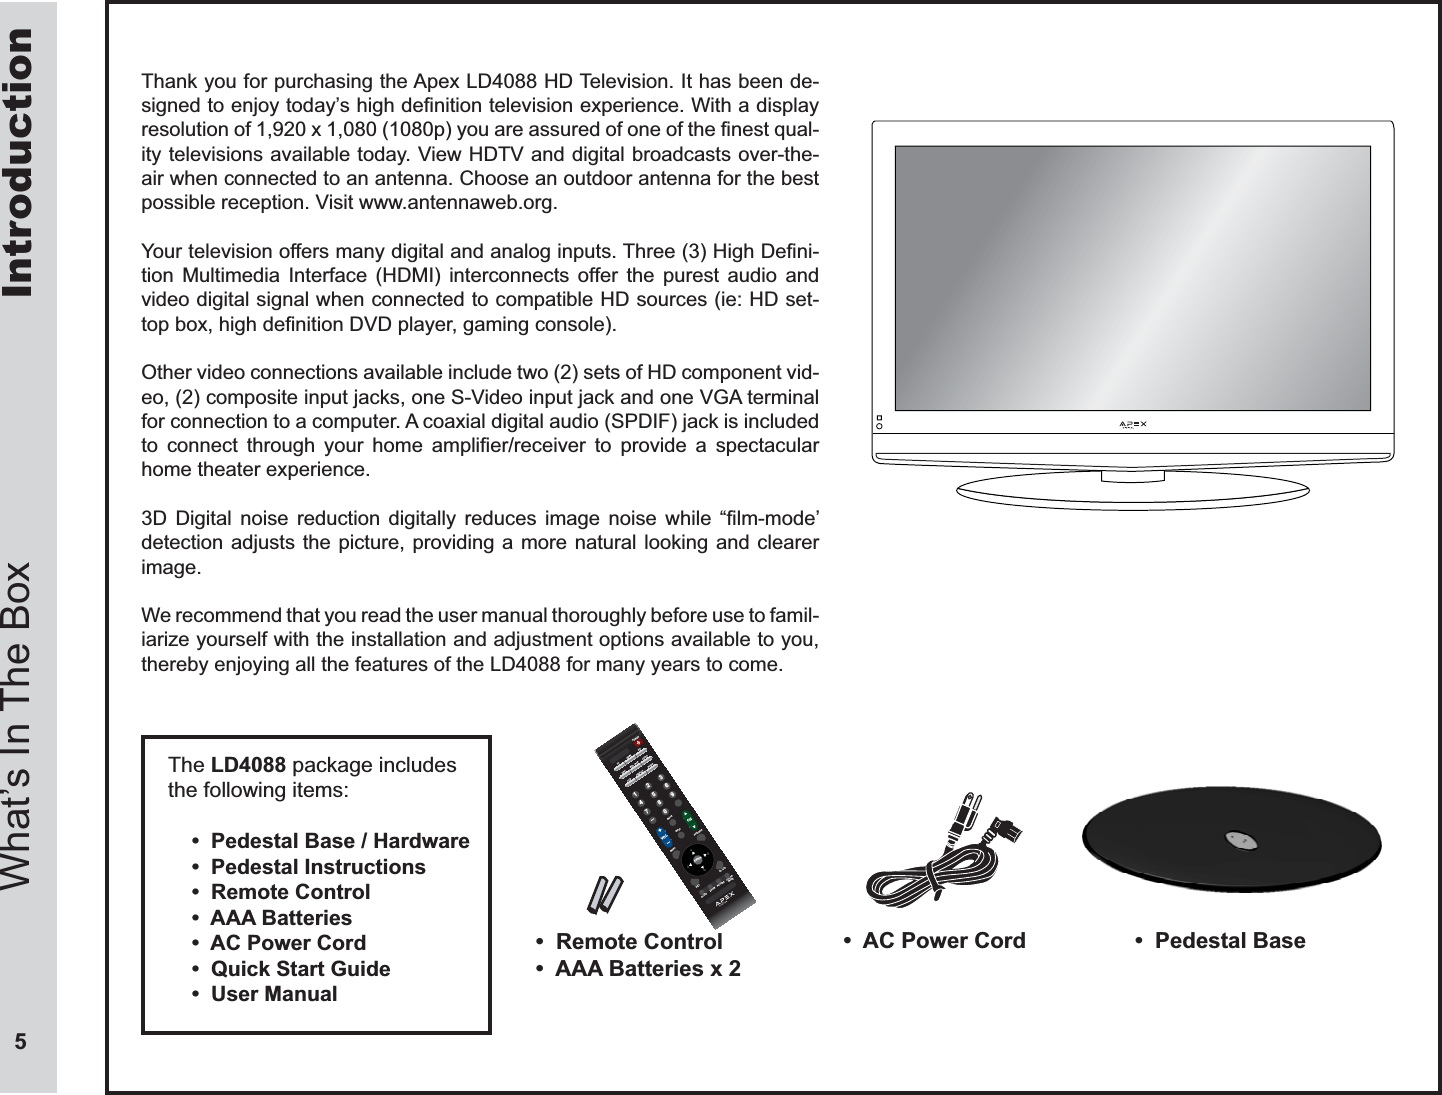 zhejiang xingxing electronic technology and development ld4088 lcd rh usermanual wiki Apex Digital TV Codes Apex Digital TV Cieling Mounts